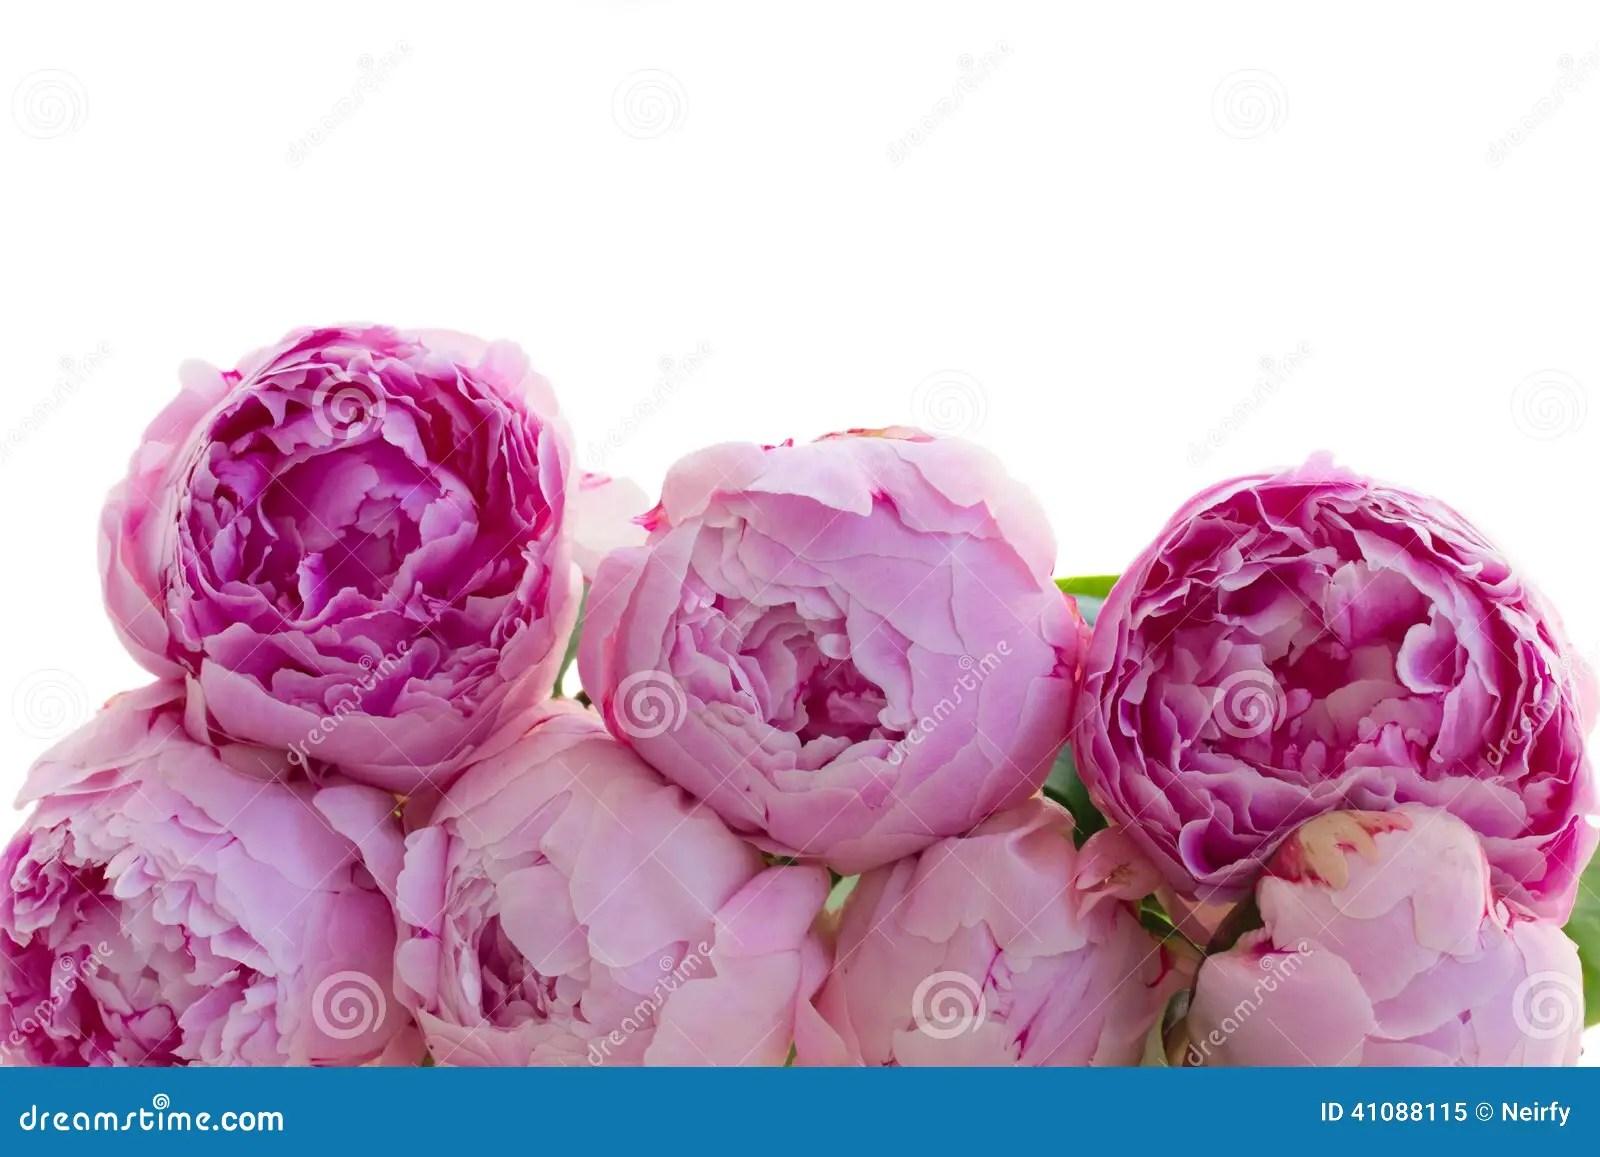 Border Of Pink Peonies Stock Photo Image 41088115